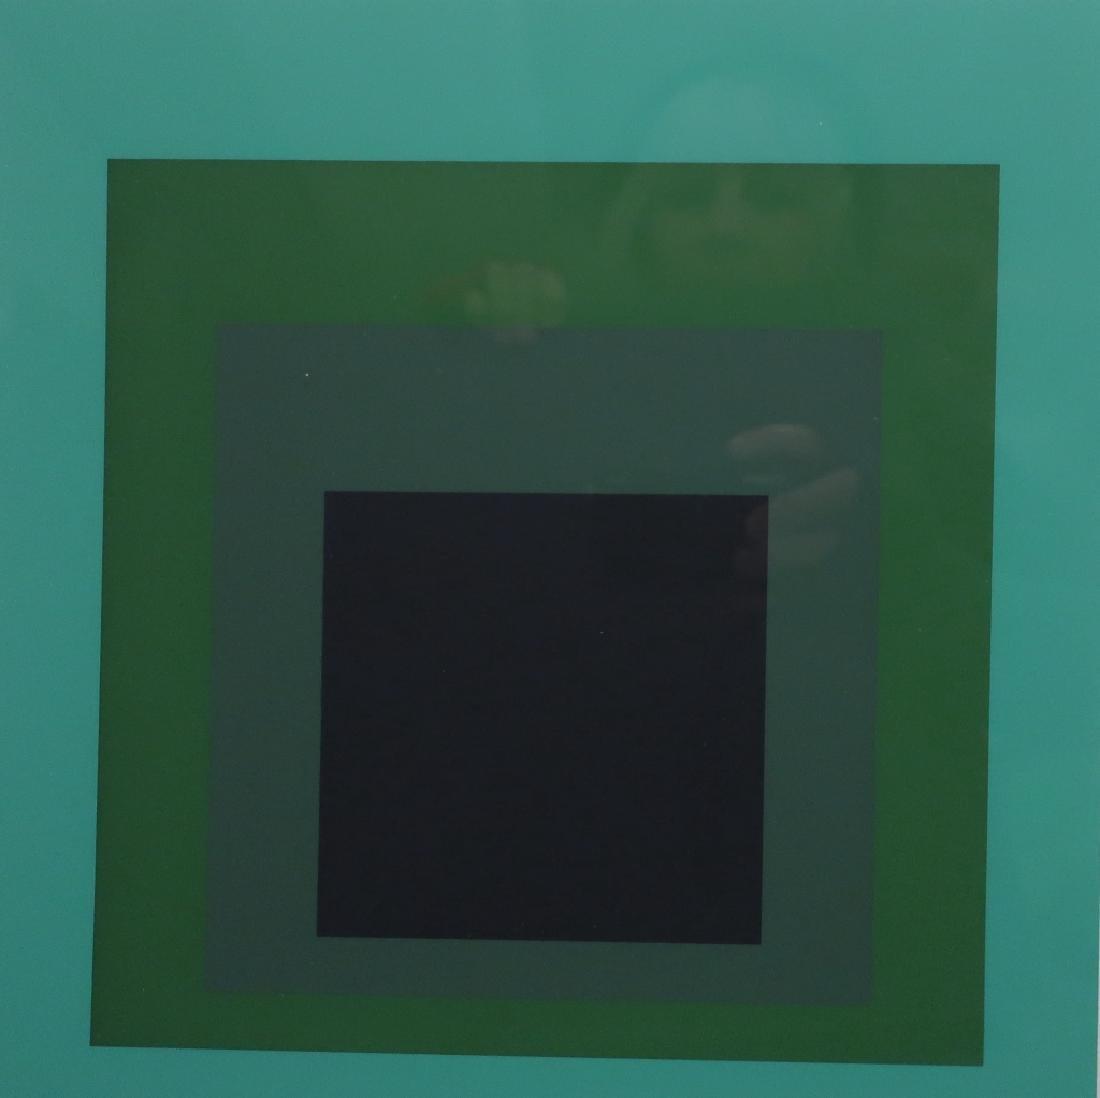 Josef Albers, 3 Silkscreens, Green/Black Squares